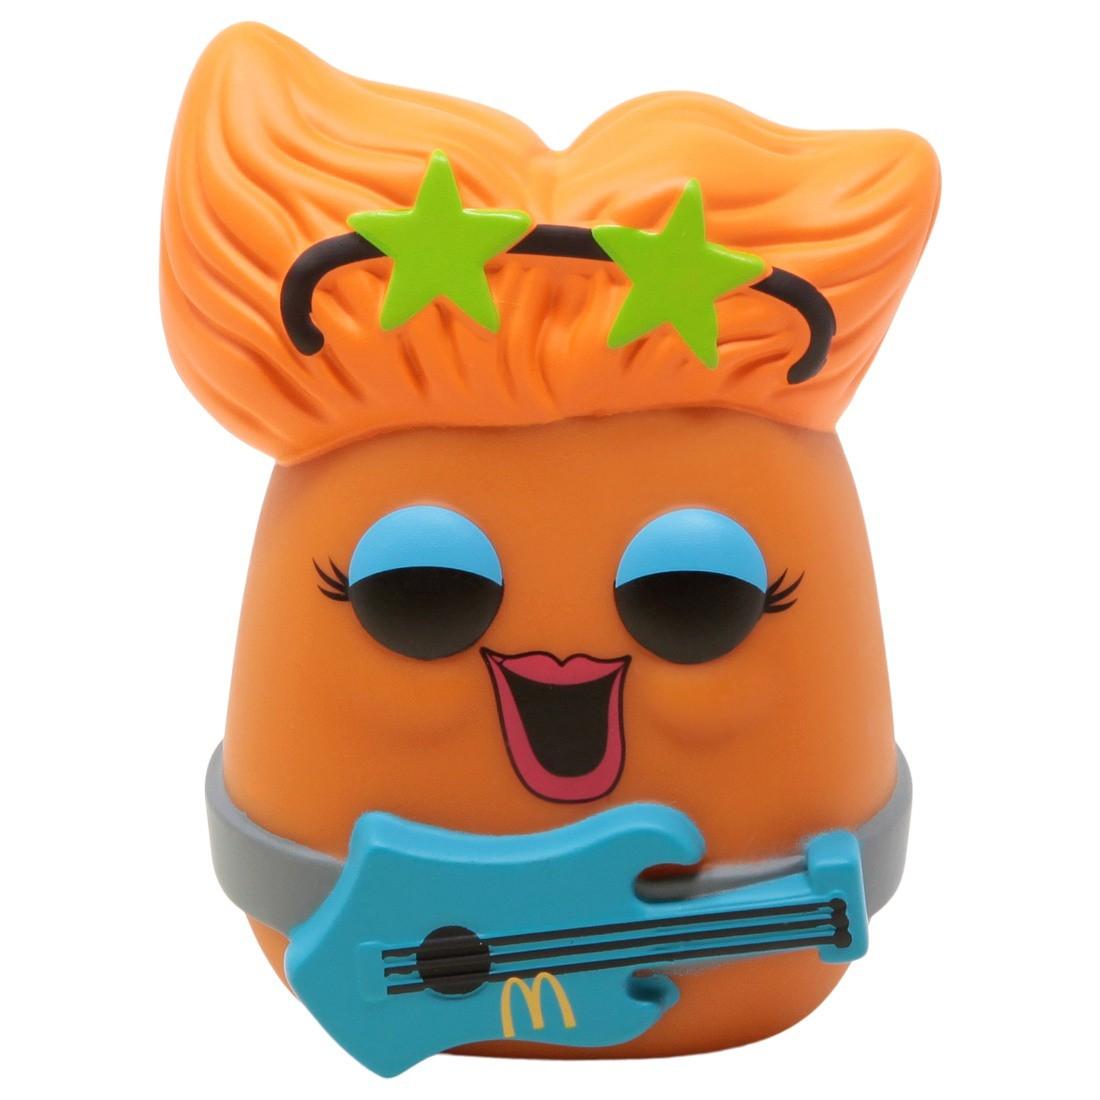 Funko POP Ad Icons McDonald's - Rockstar McNugget (orange)